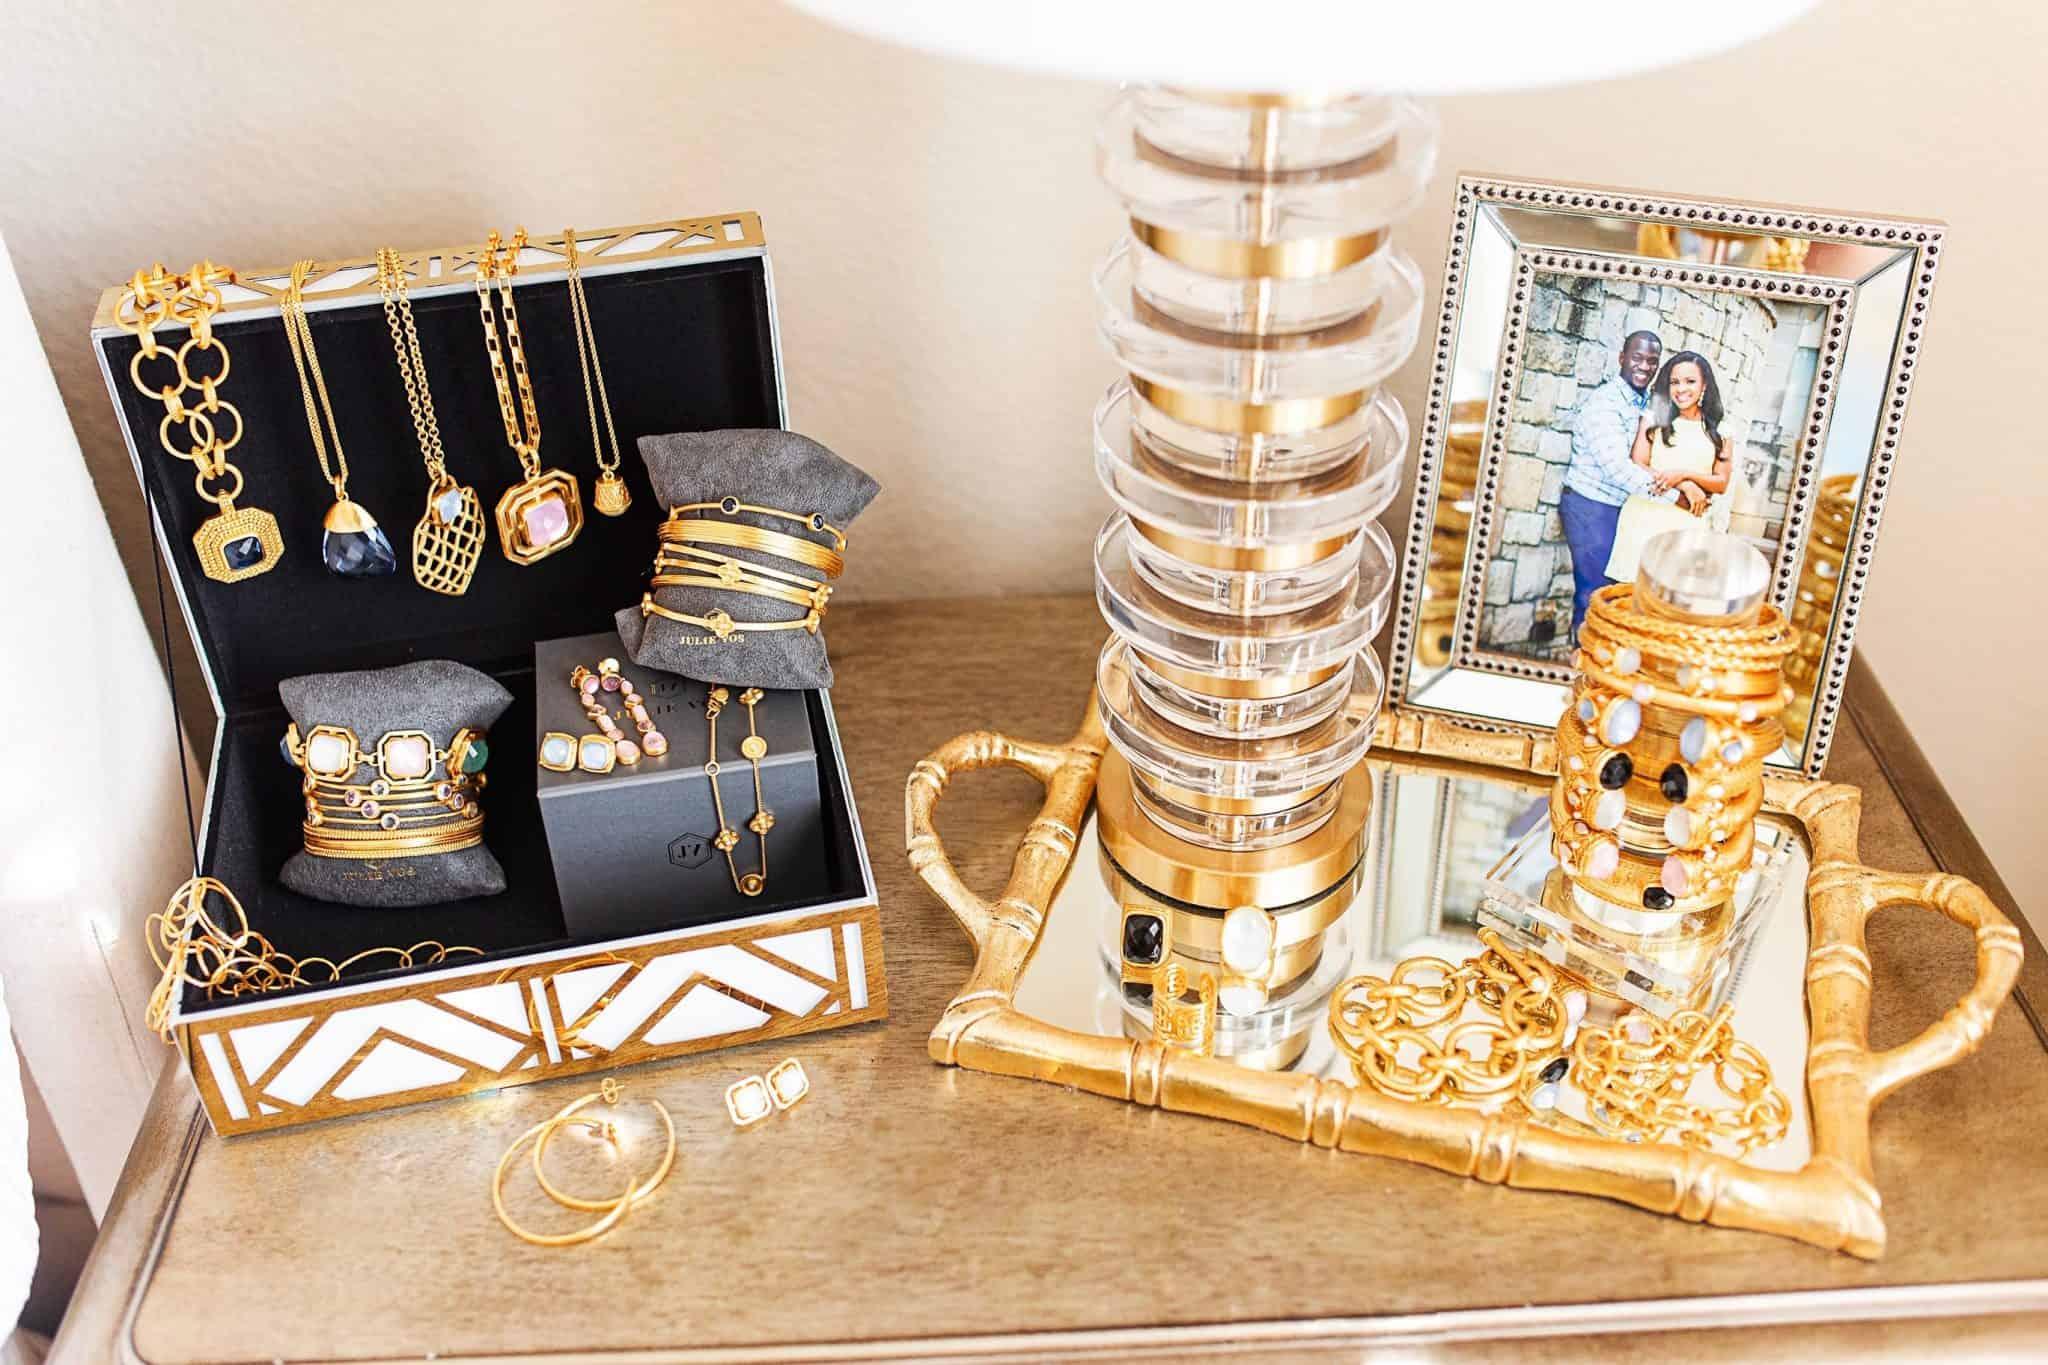 Julie Vos Sample Sale favorites featured by top US fashion blog, Glamorous Versatility